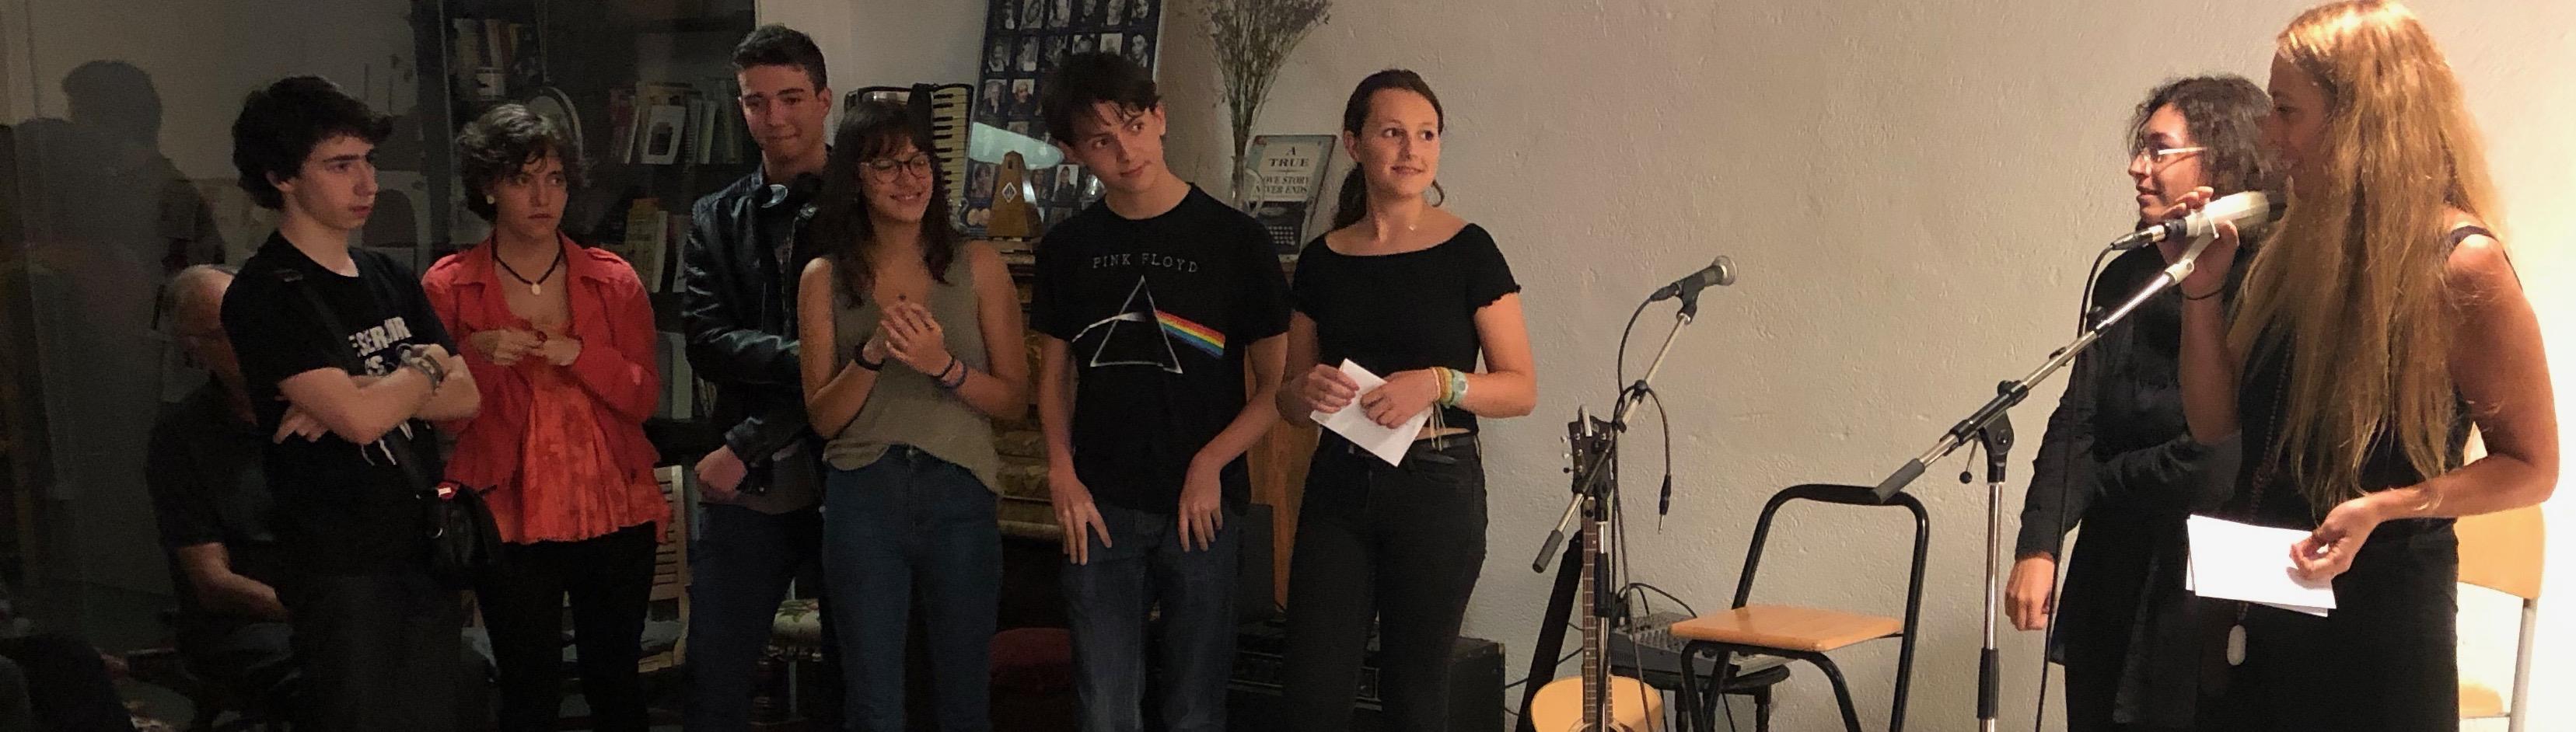 entrega de premios V certamen joven de relato 2019